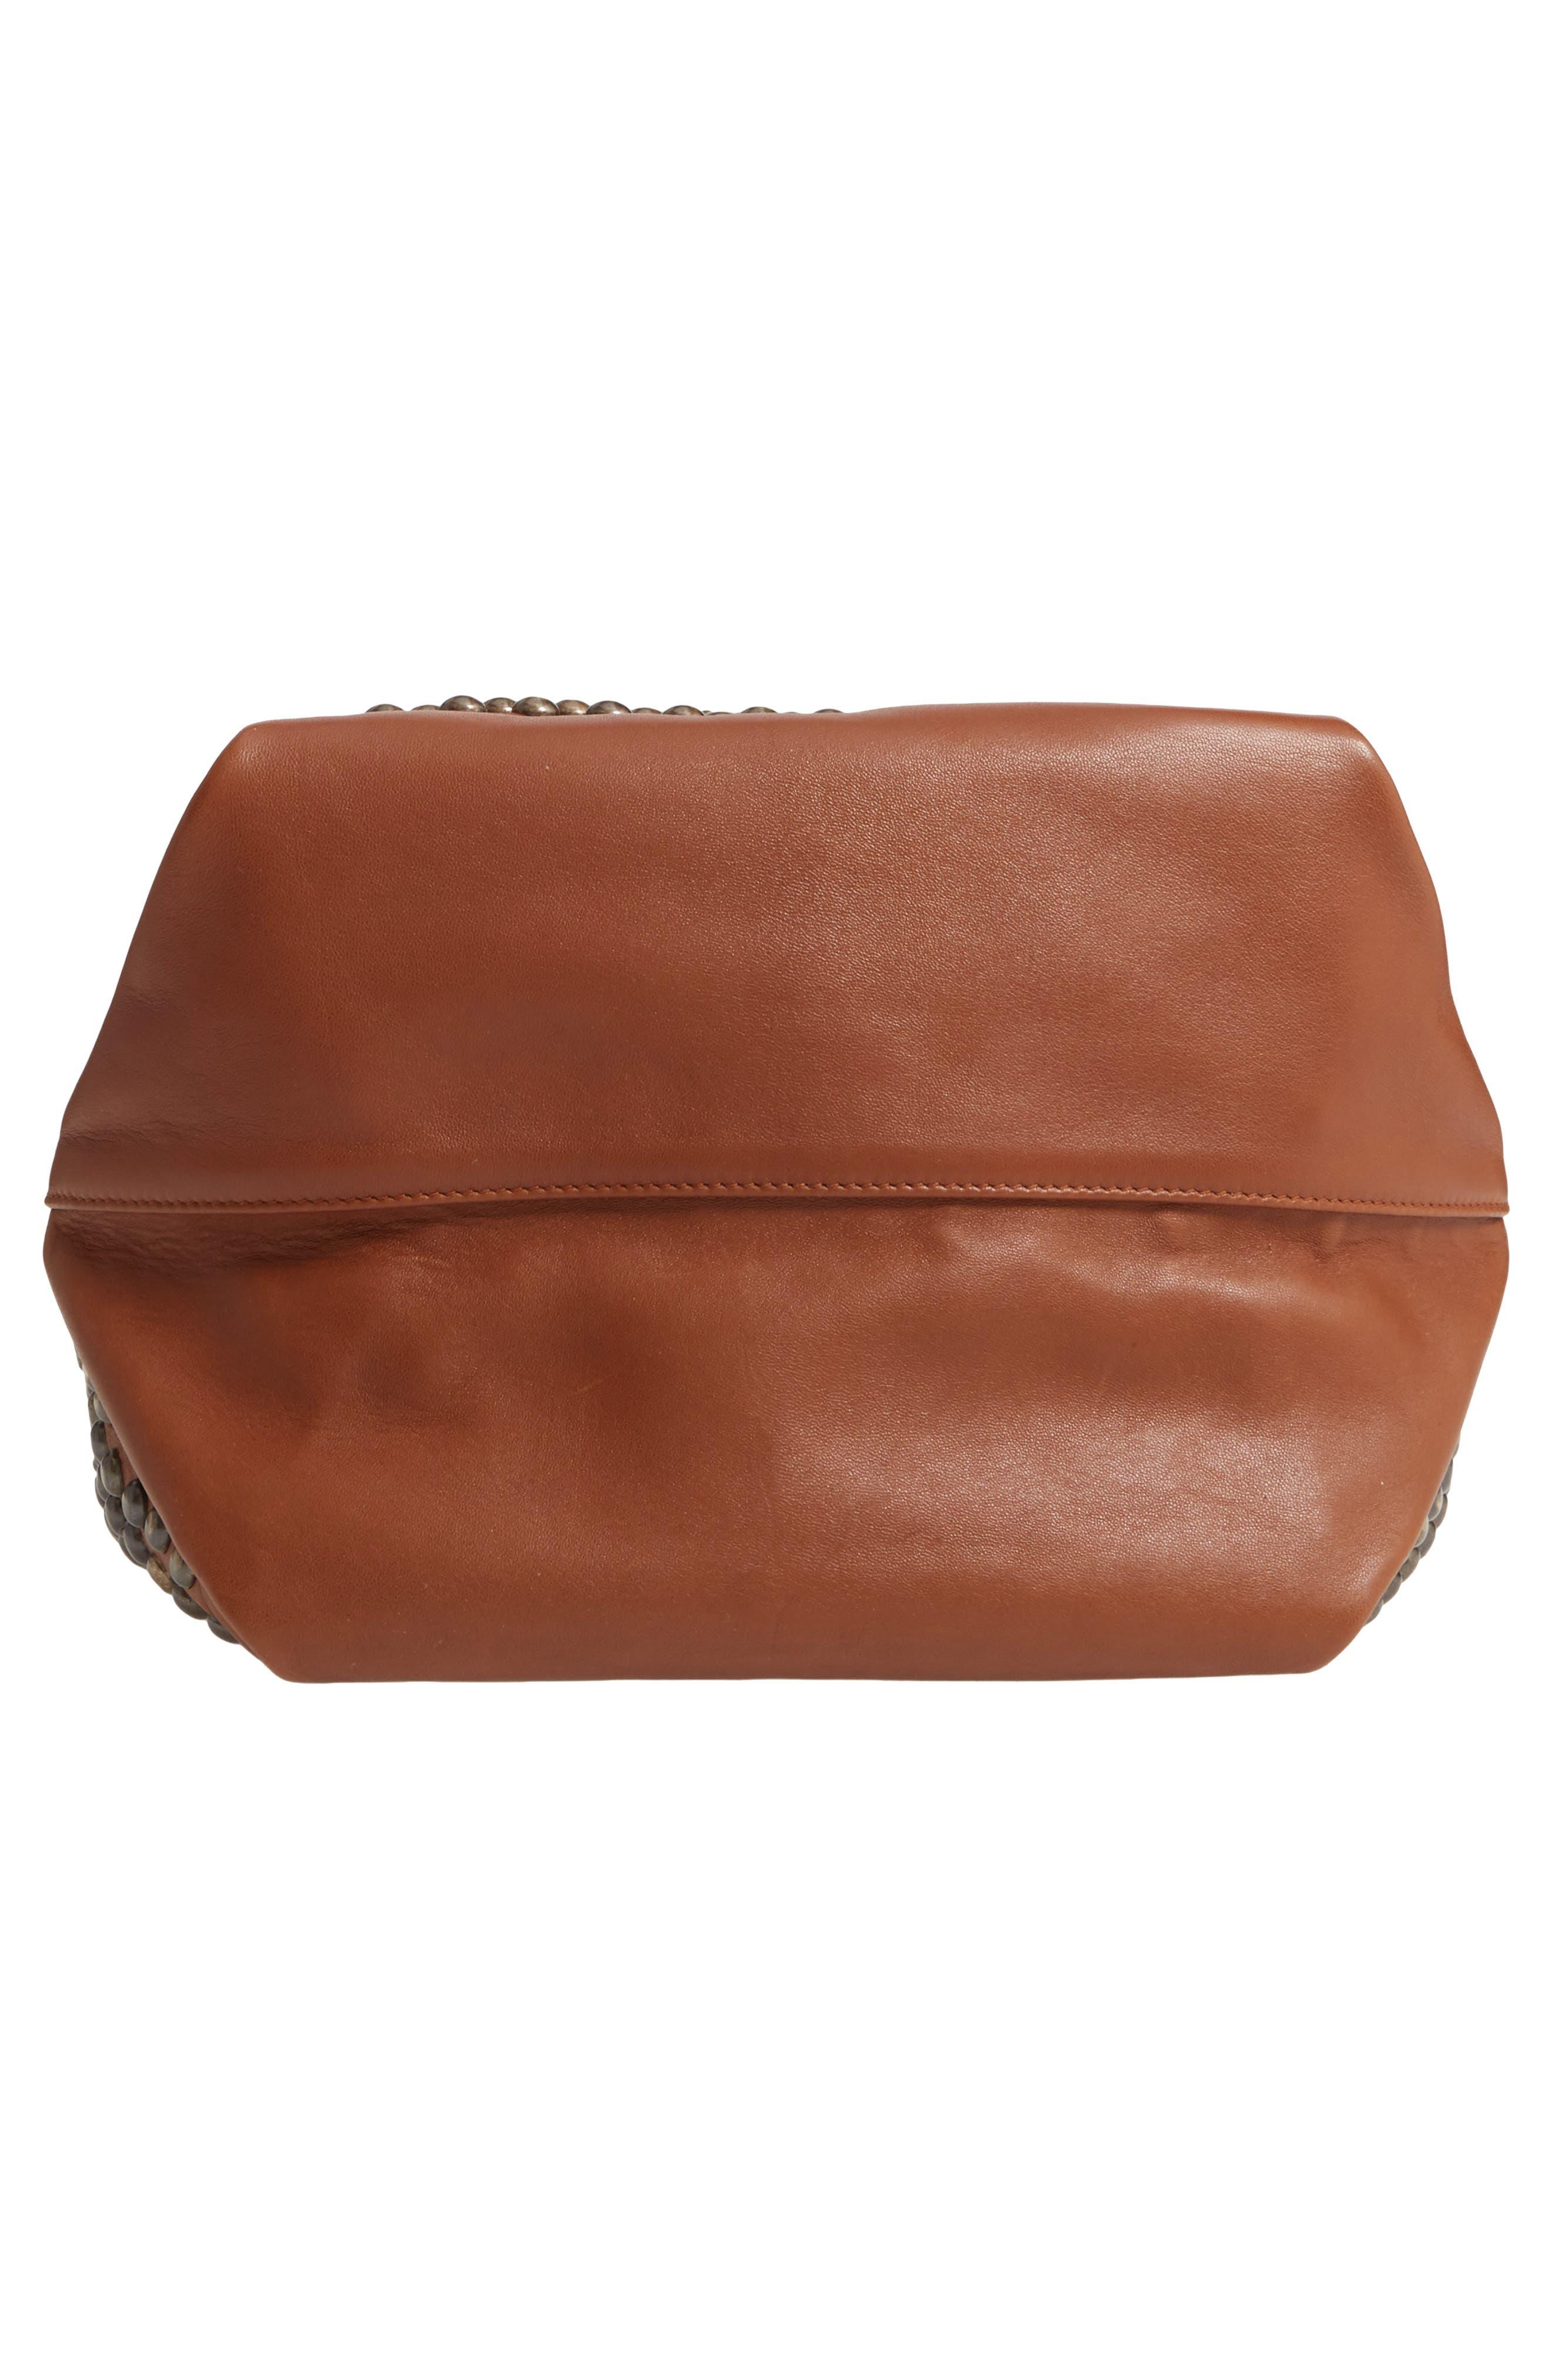 SAINT LAURENT, Teddy Studded Leather Bucket Bag, Alternate thumbnail 6, color, 200